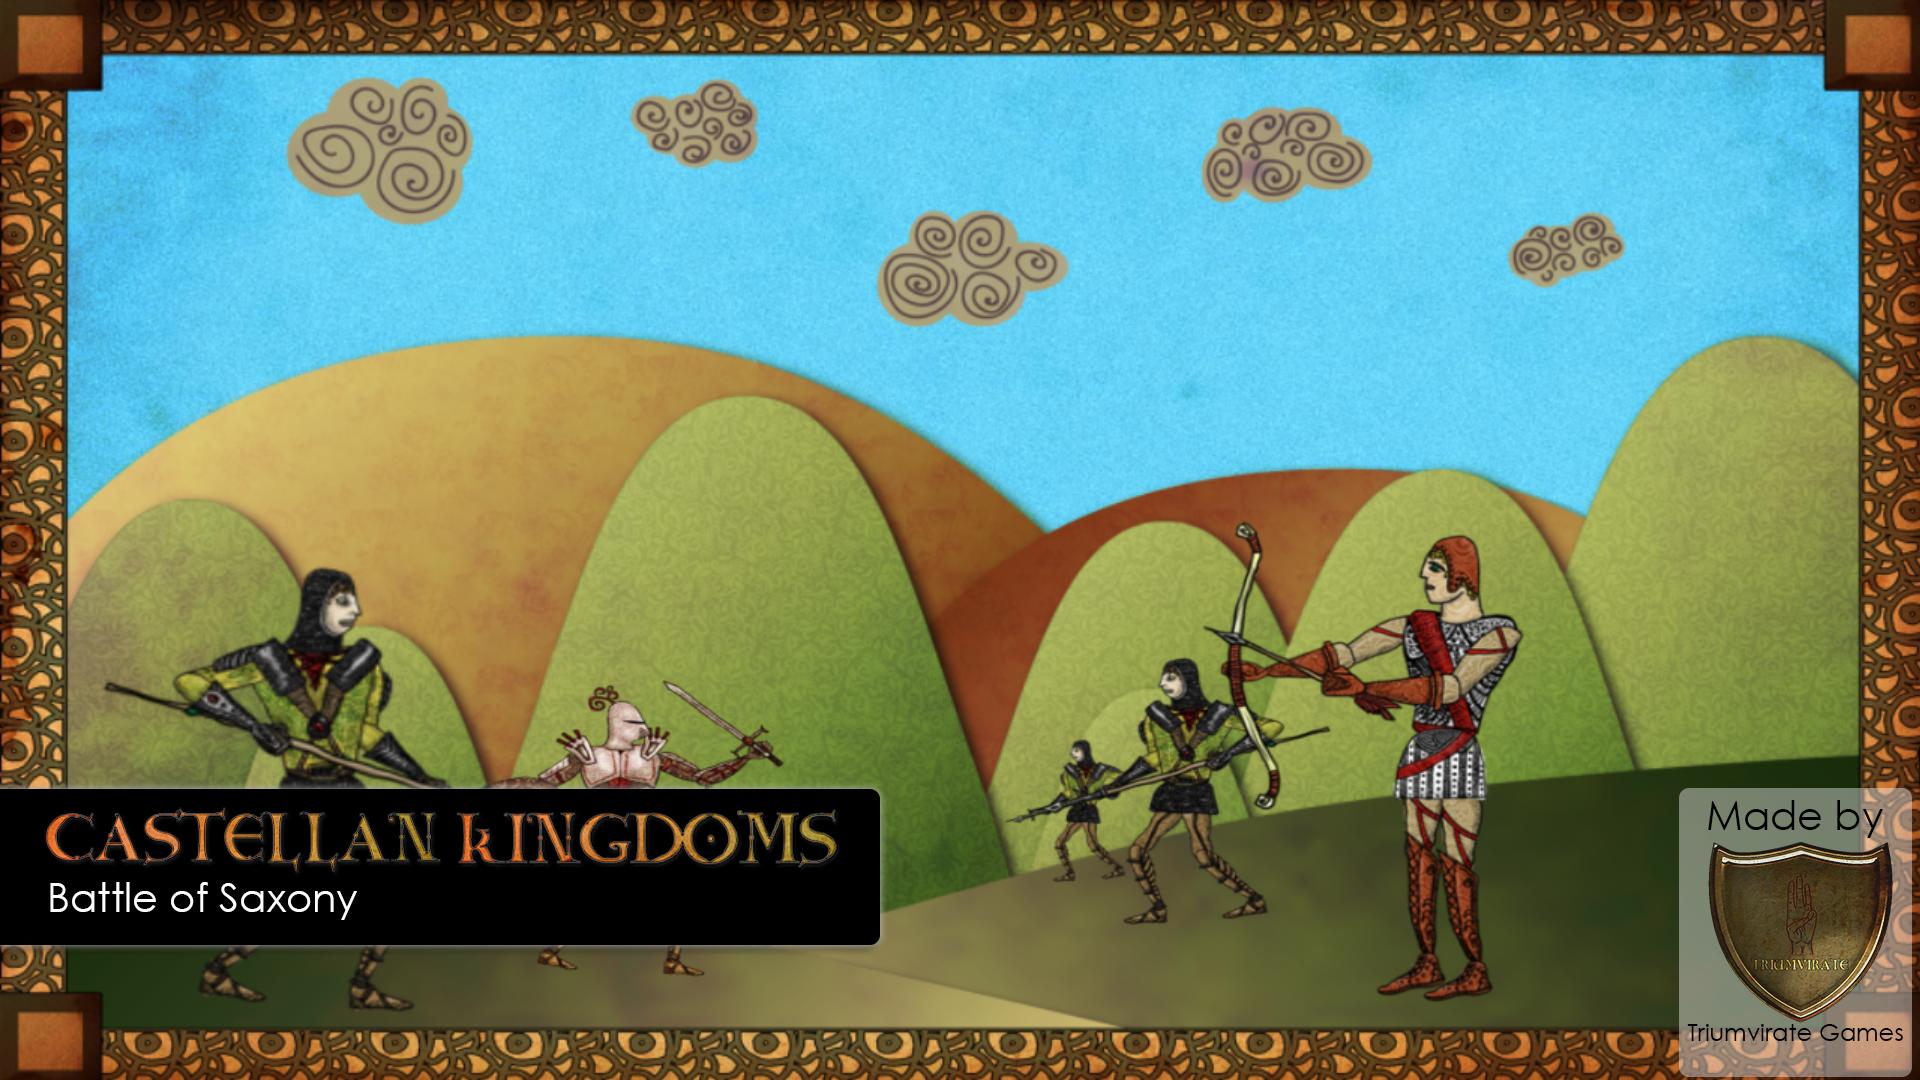 Castellan Kingdoms battle of saxony